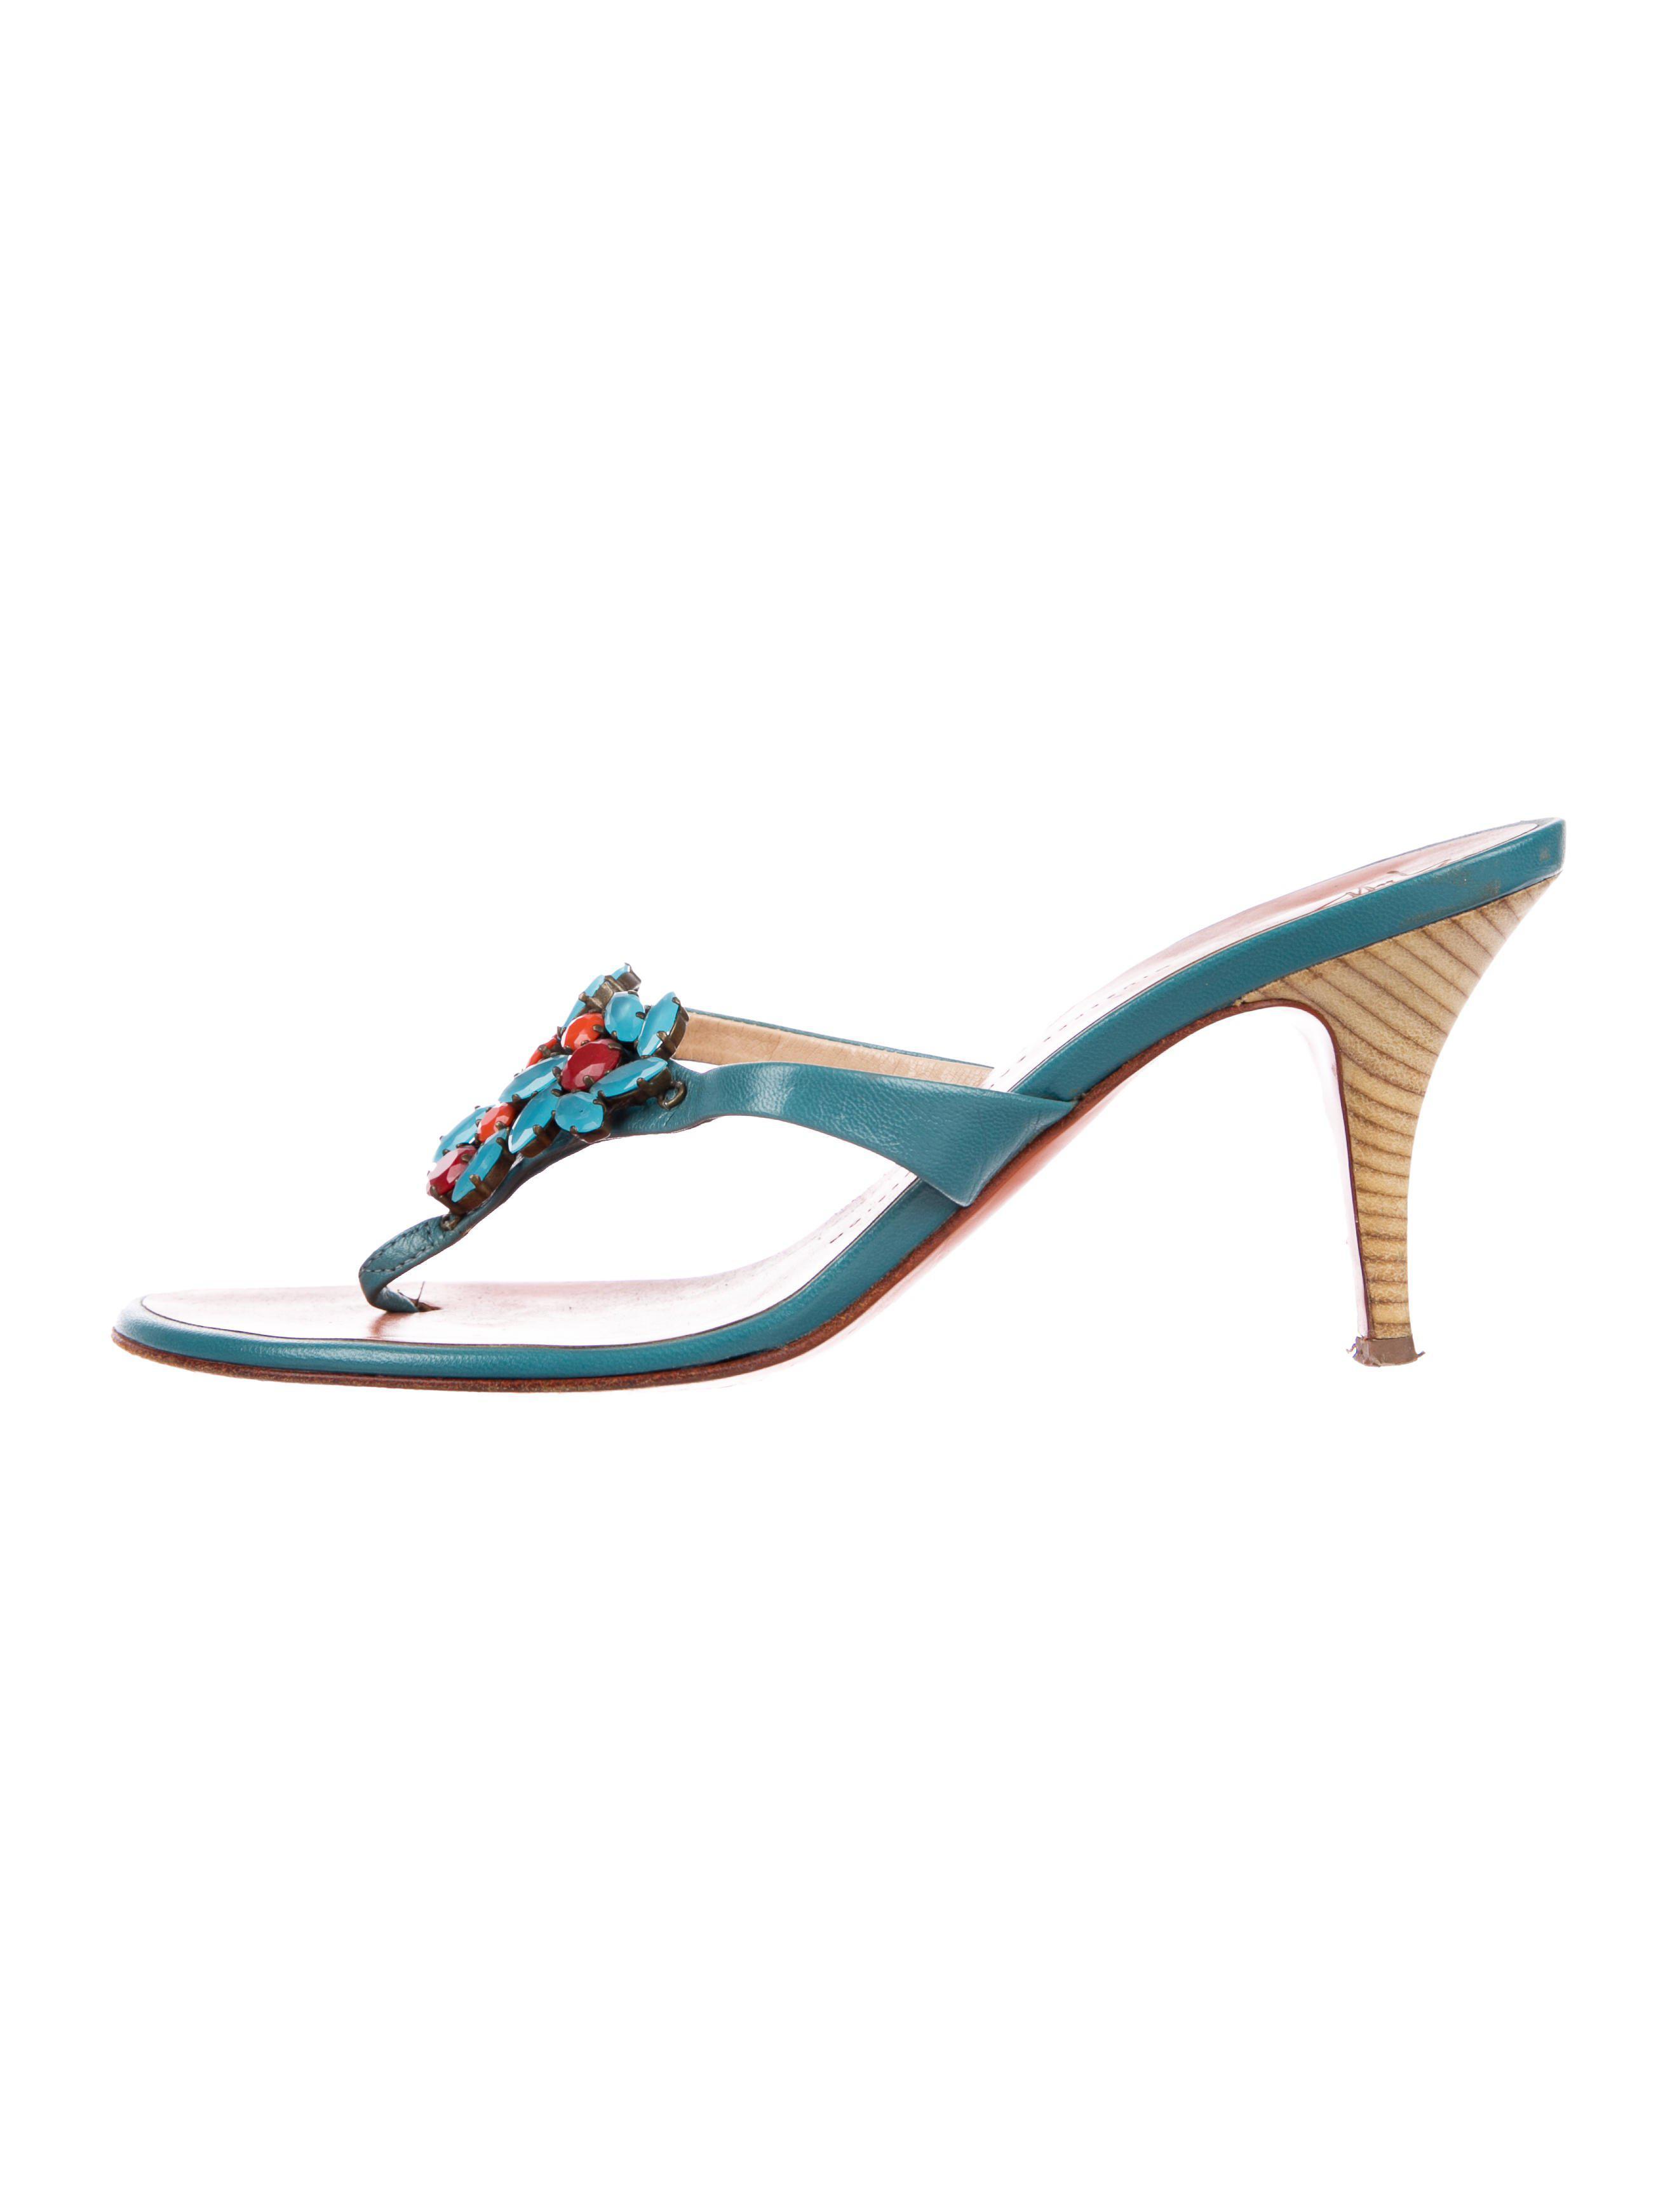 3e8f5aed1352 Lyst - Giuseppe Zanotti Embellished Slide Sandals in Blue